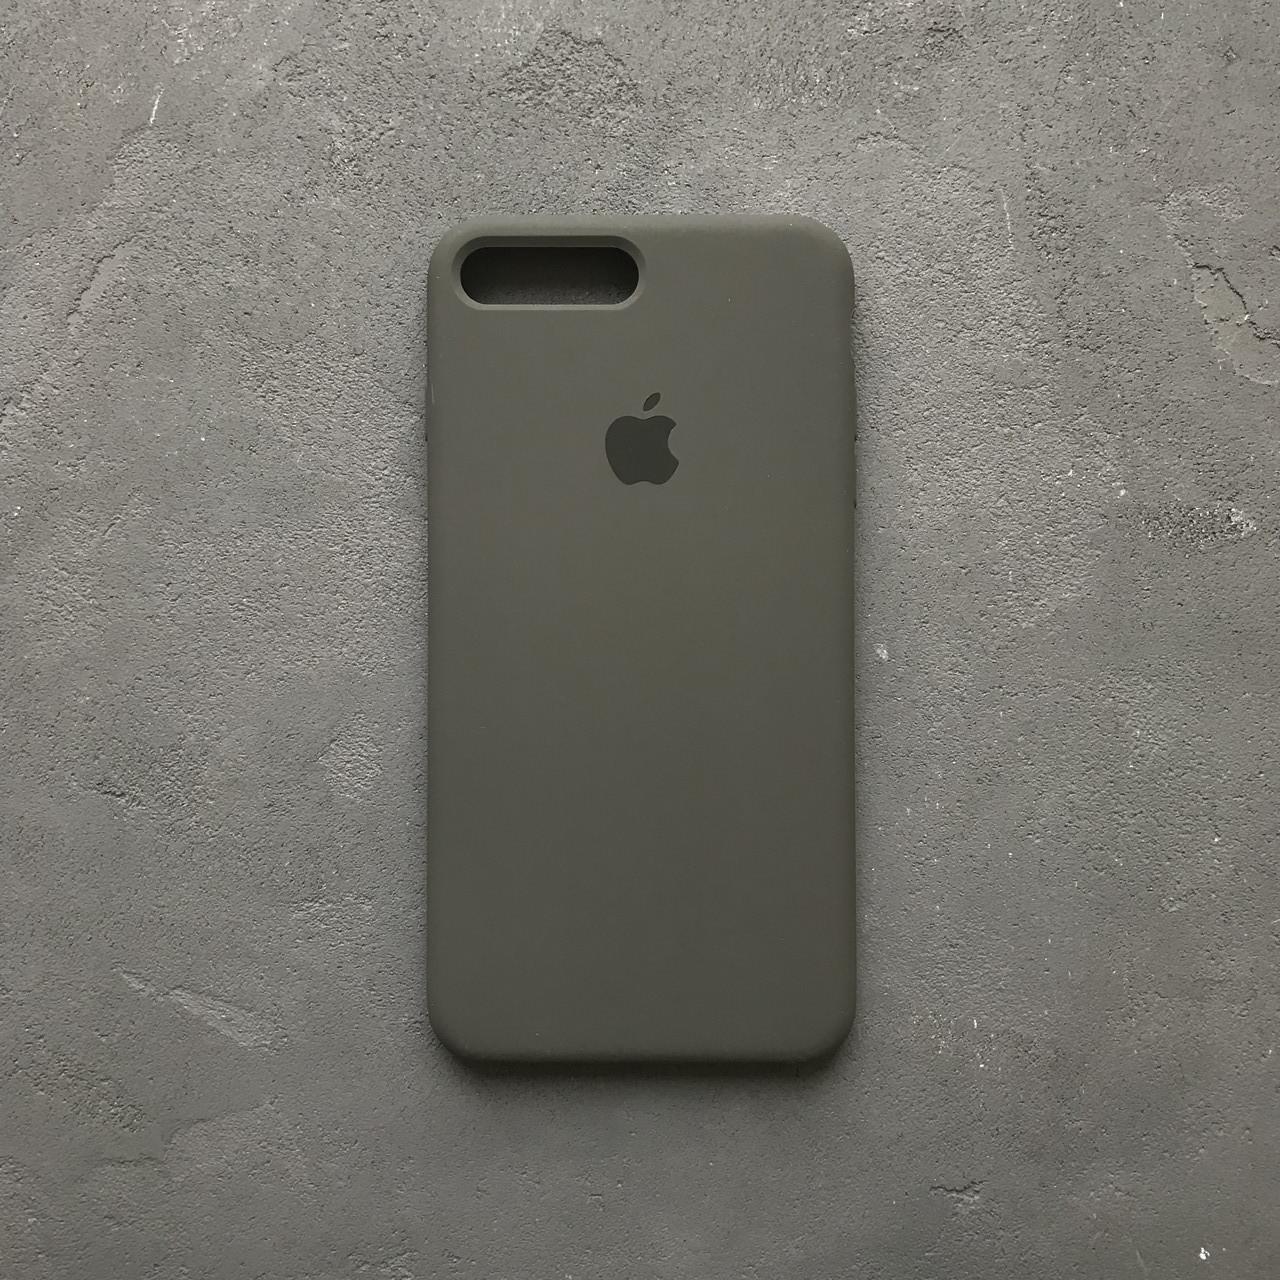 buy online eae3b 96dee Силиконовый чехол на айфон 7 plus оливковый Silicone Case iPhone 7+ dark  olive - Bigl.ua